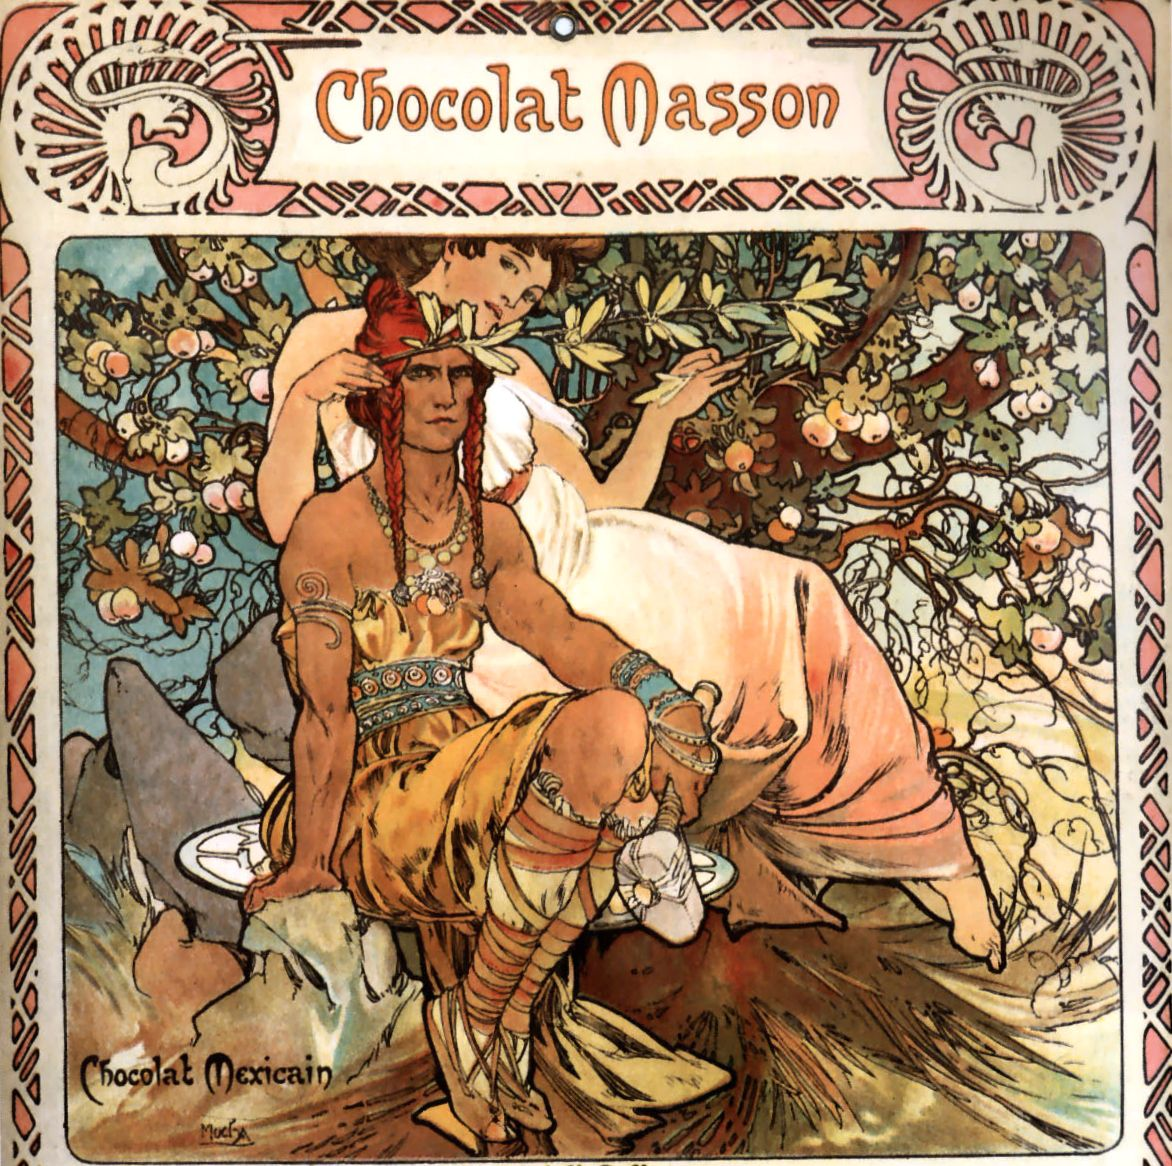 Beautiful Chocolate Advert Mucha Art Alphonse Mucha Art